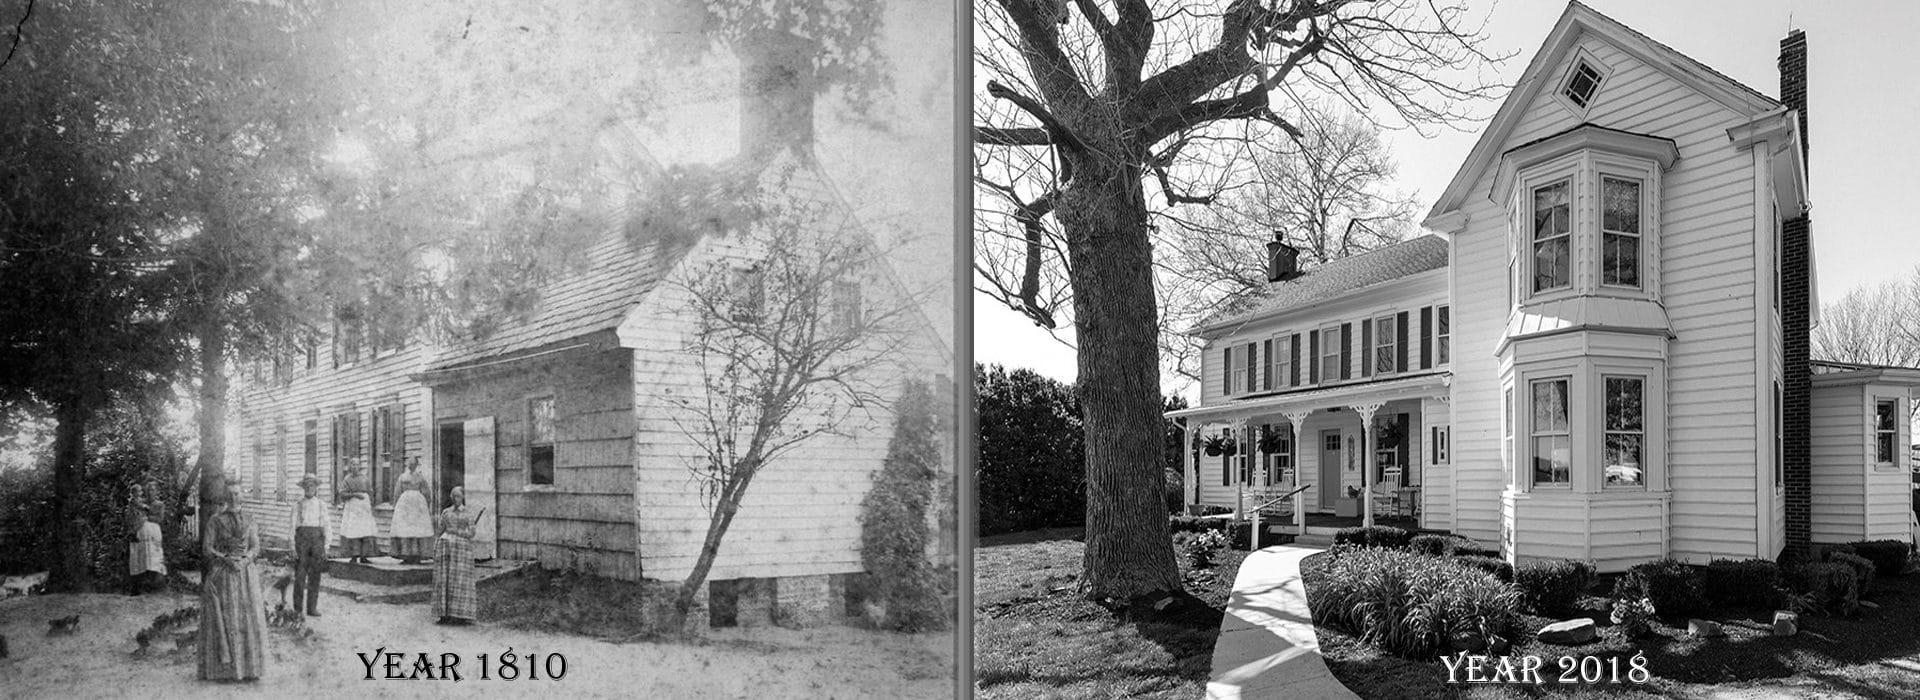 1810 house vs 2018